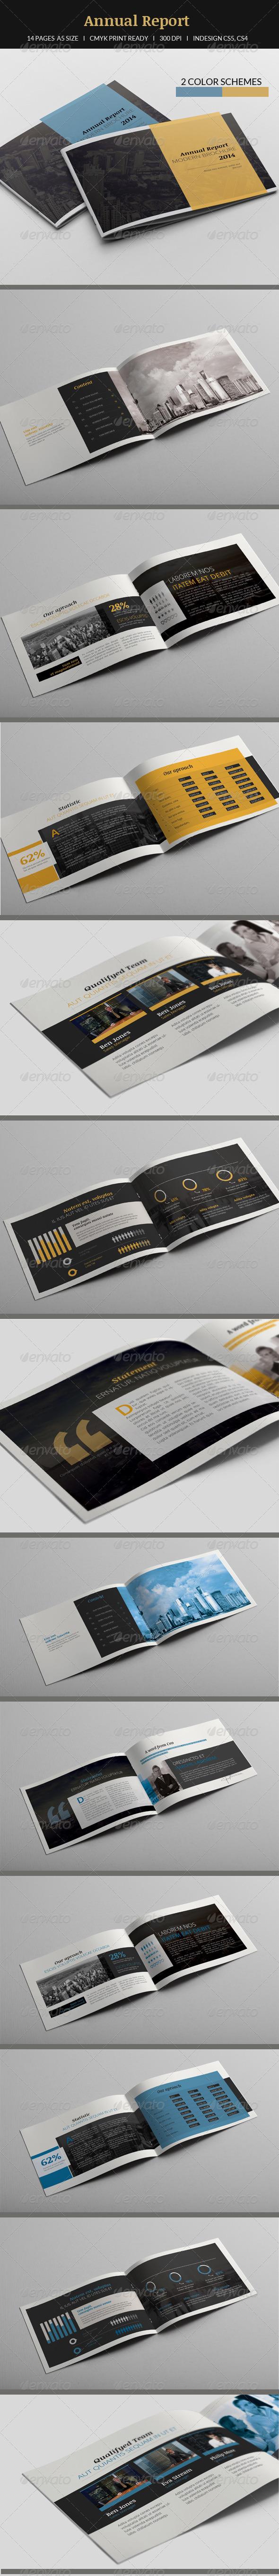 Annual Report A5